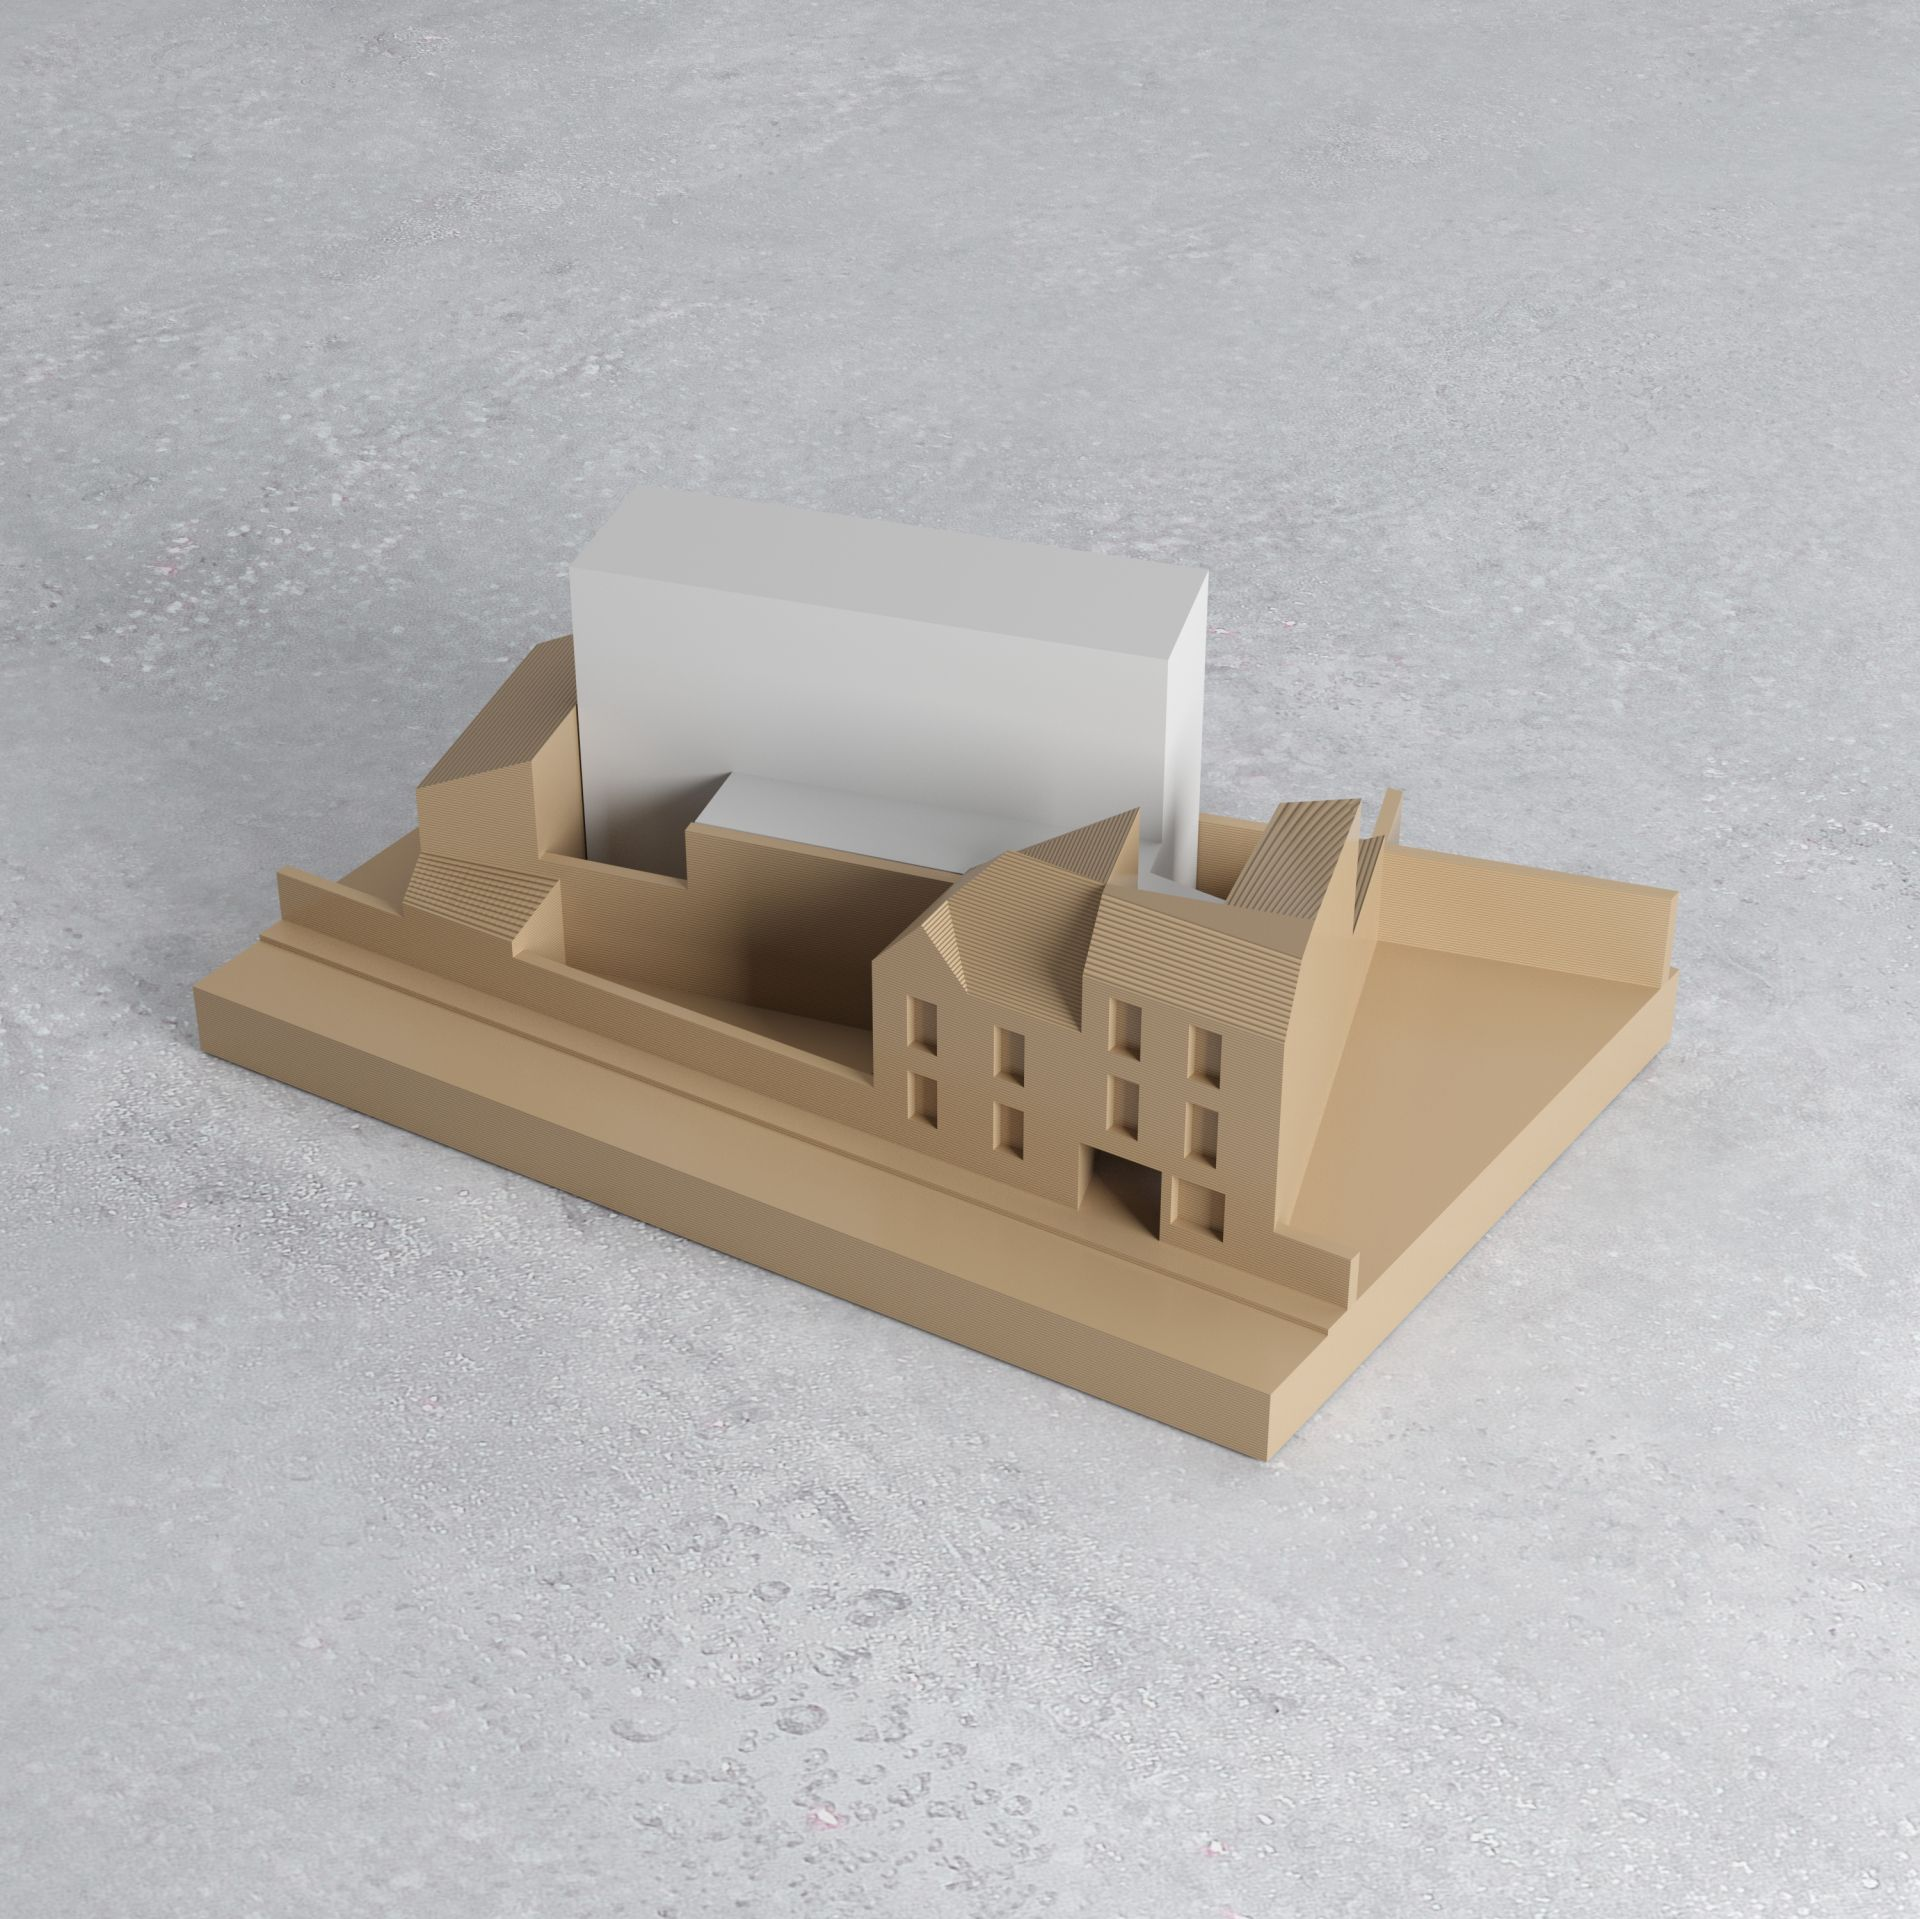 Supervue la architecture musee musee paul bert a putaux Medium